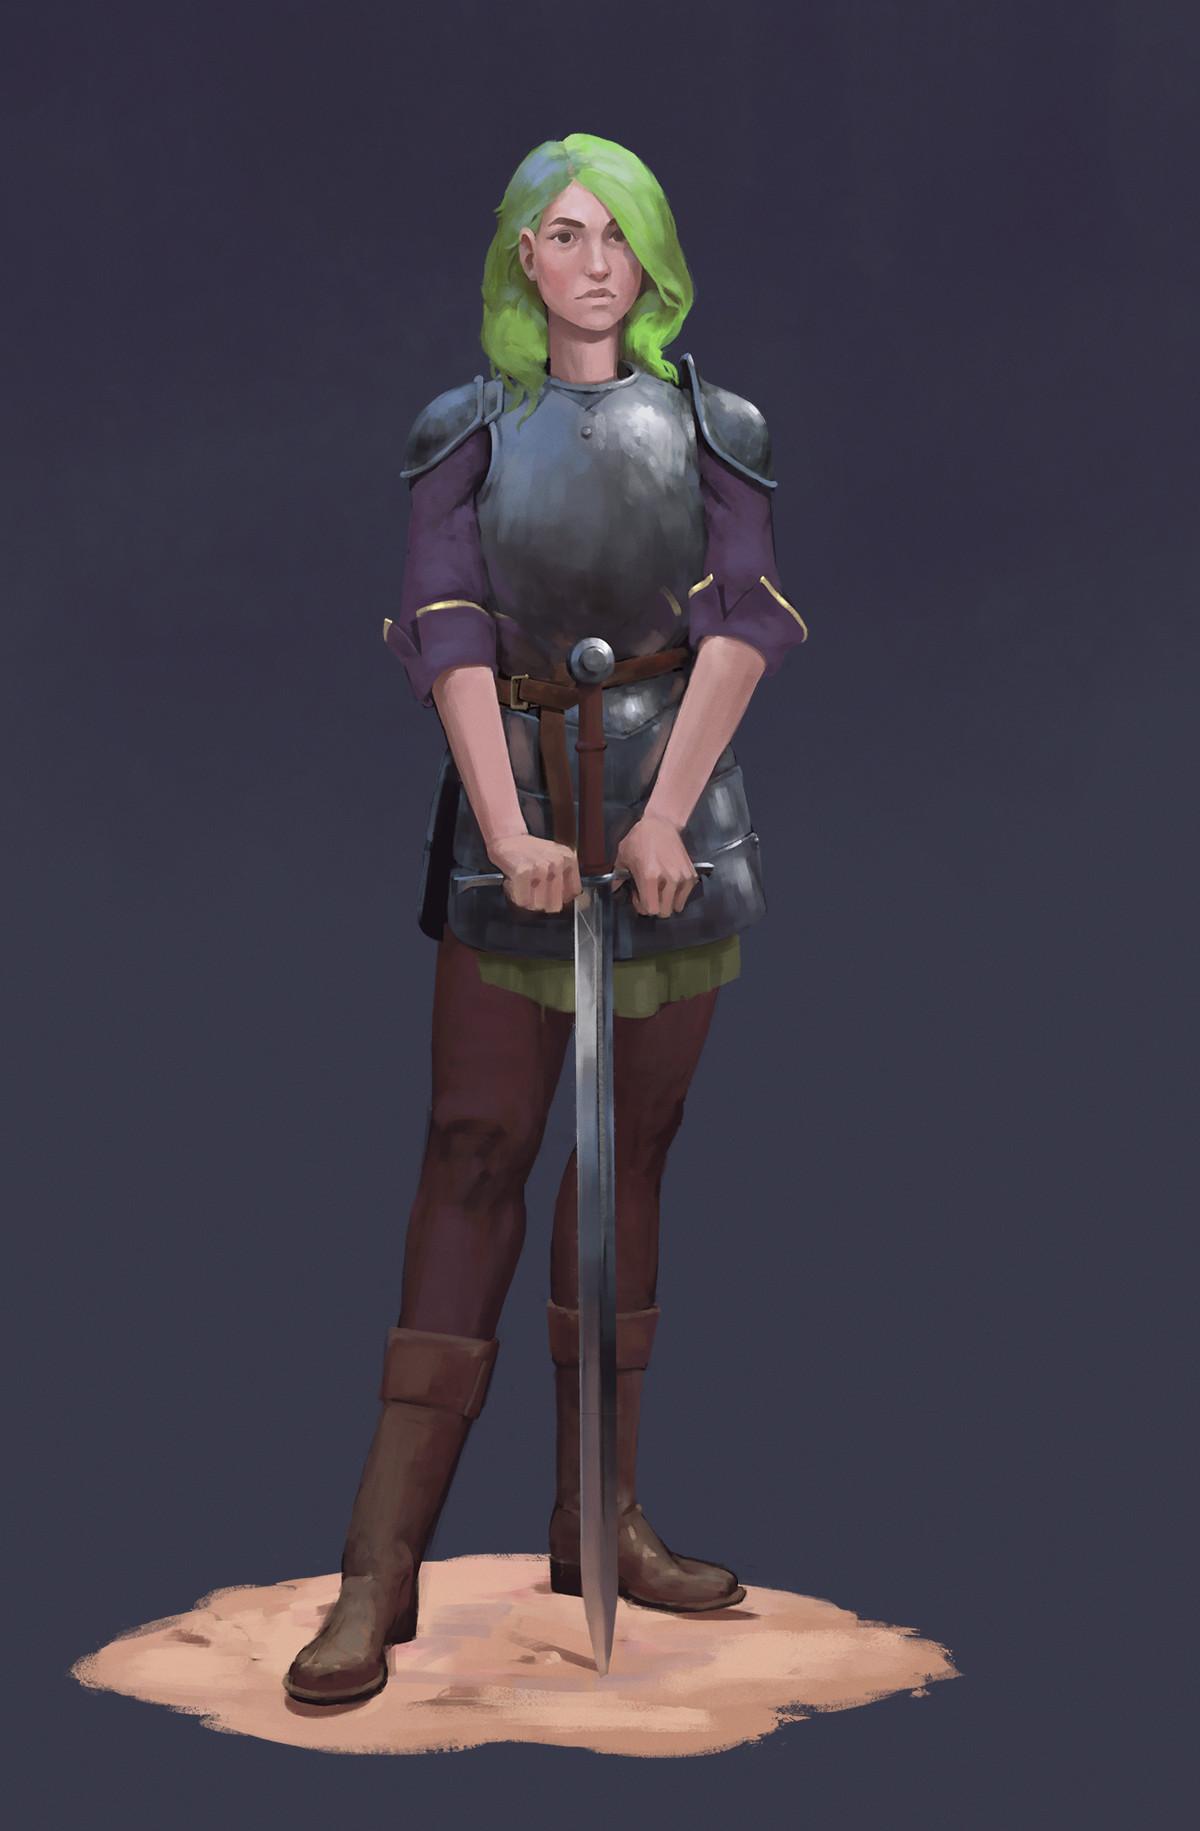 alexandr-evstigneev-green-head.jpg